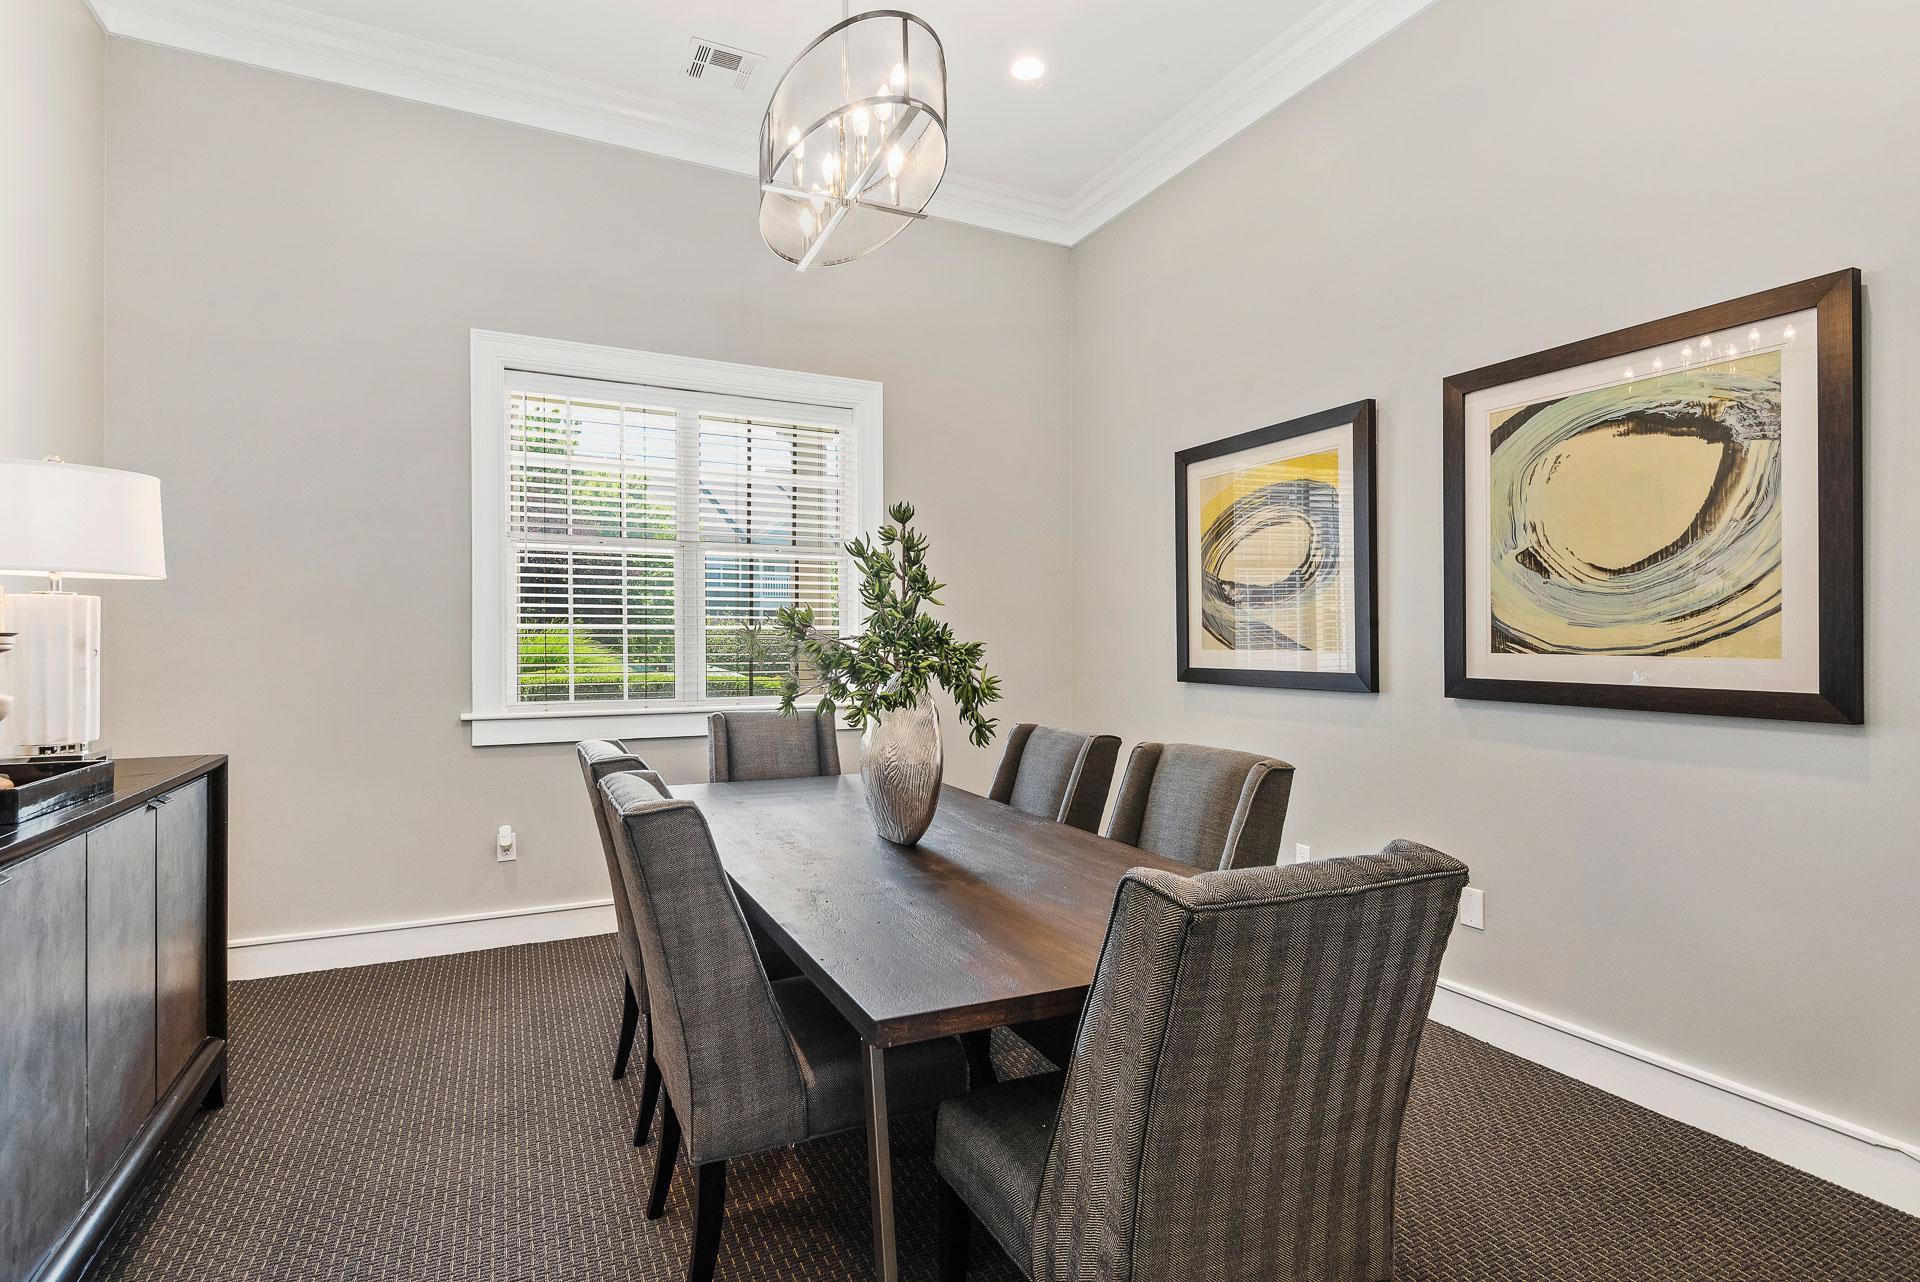 Sherpa Media Kansas City - Apartments & Multi-Family Housing - 05